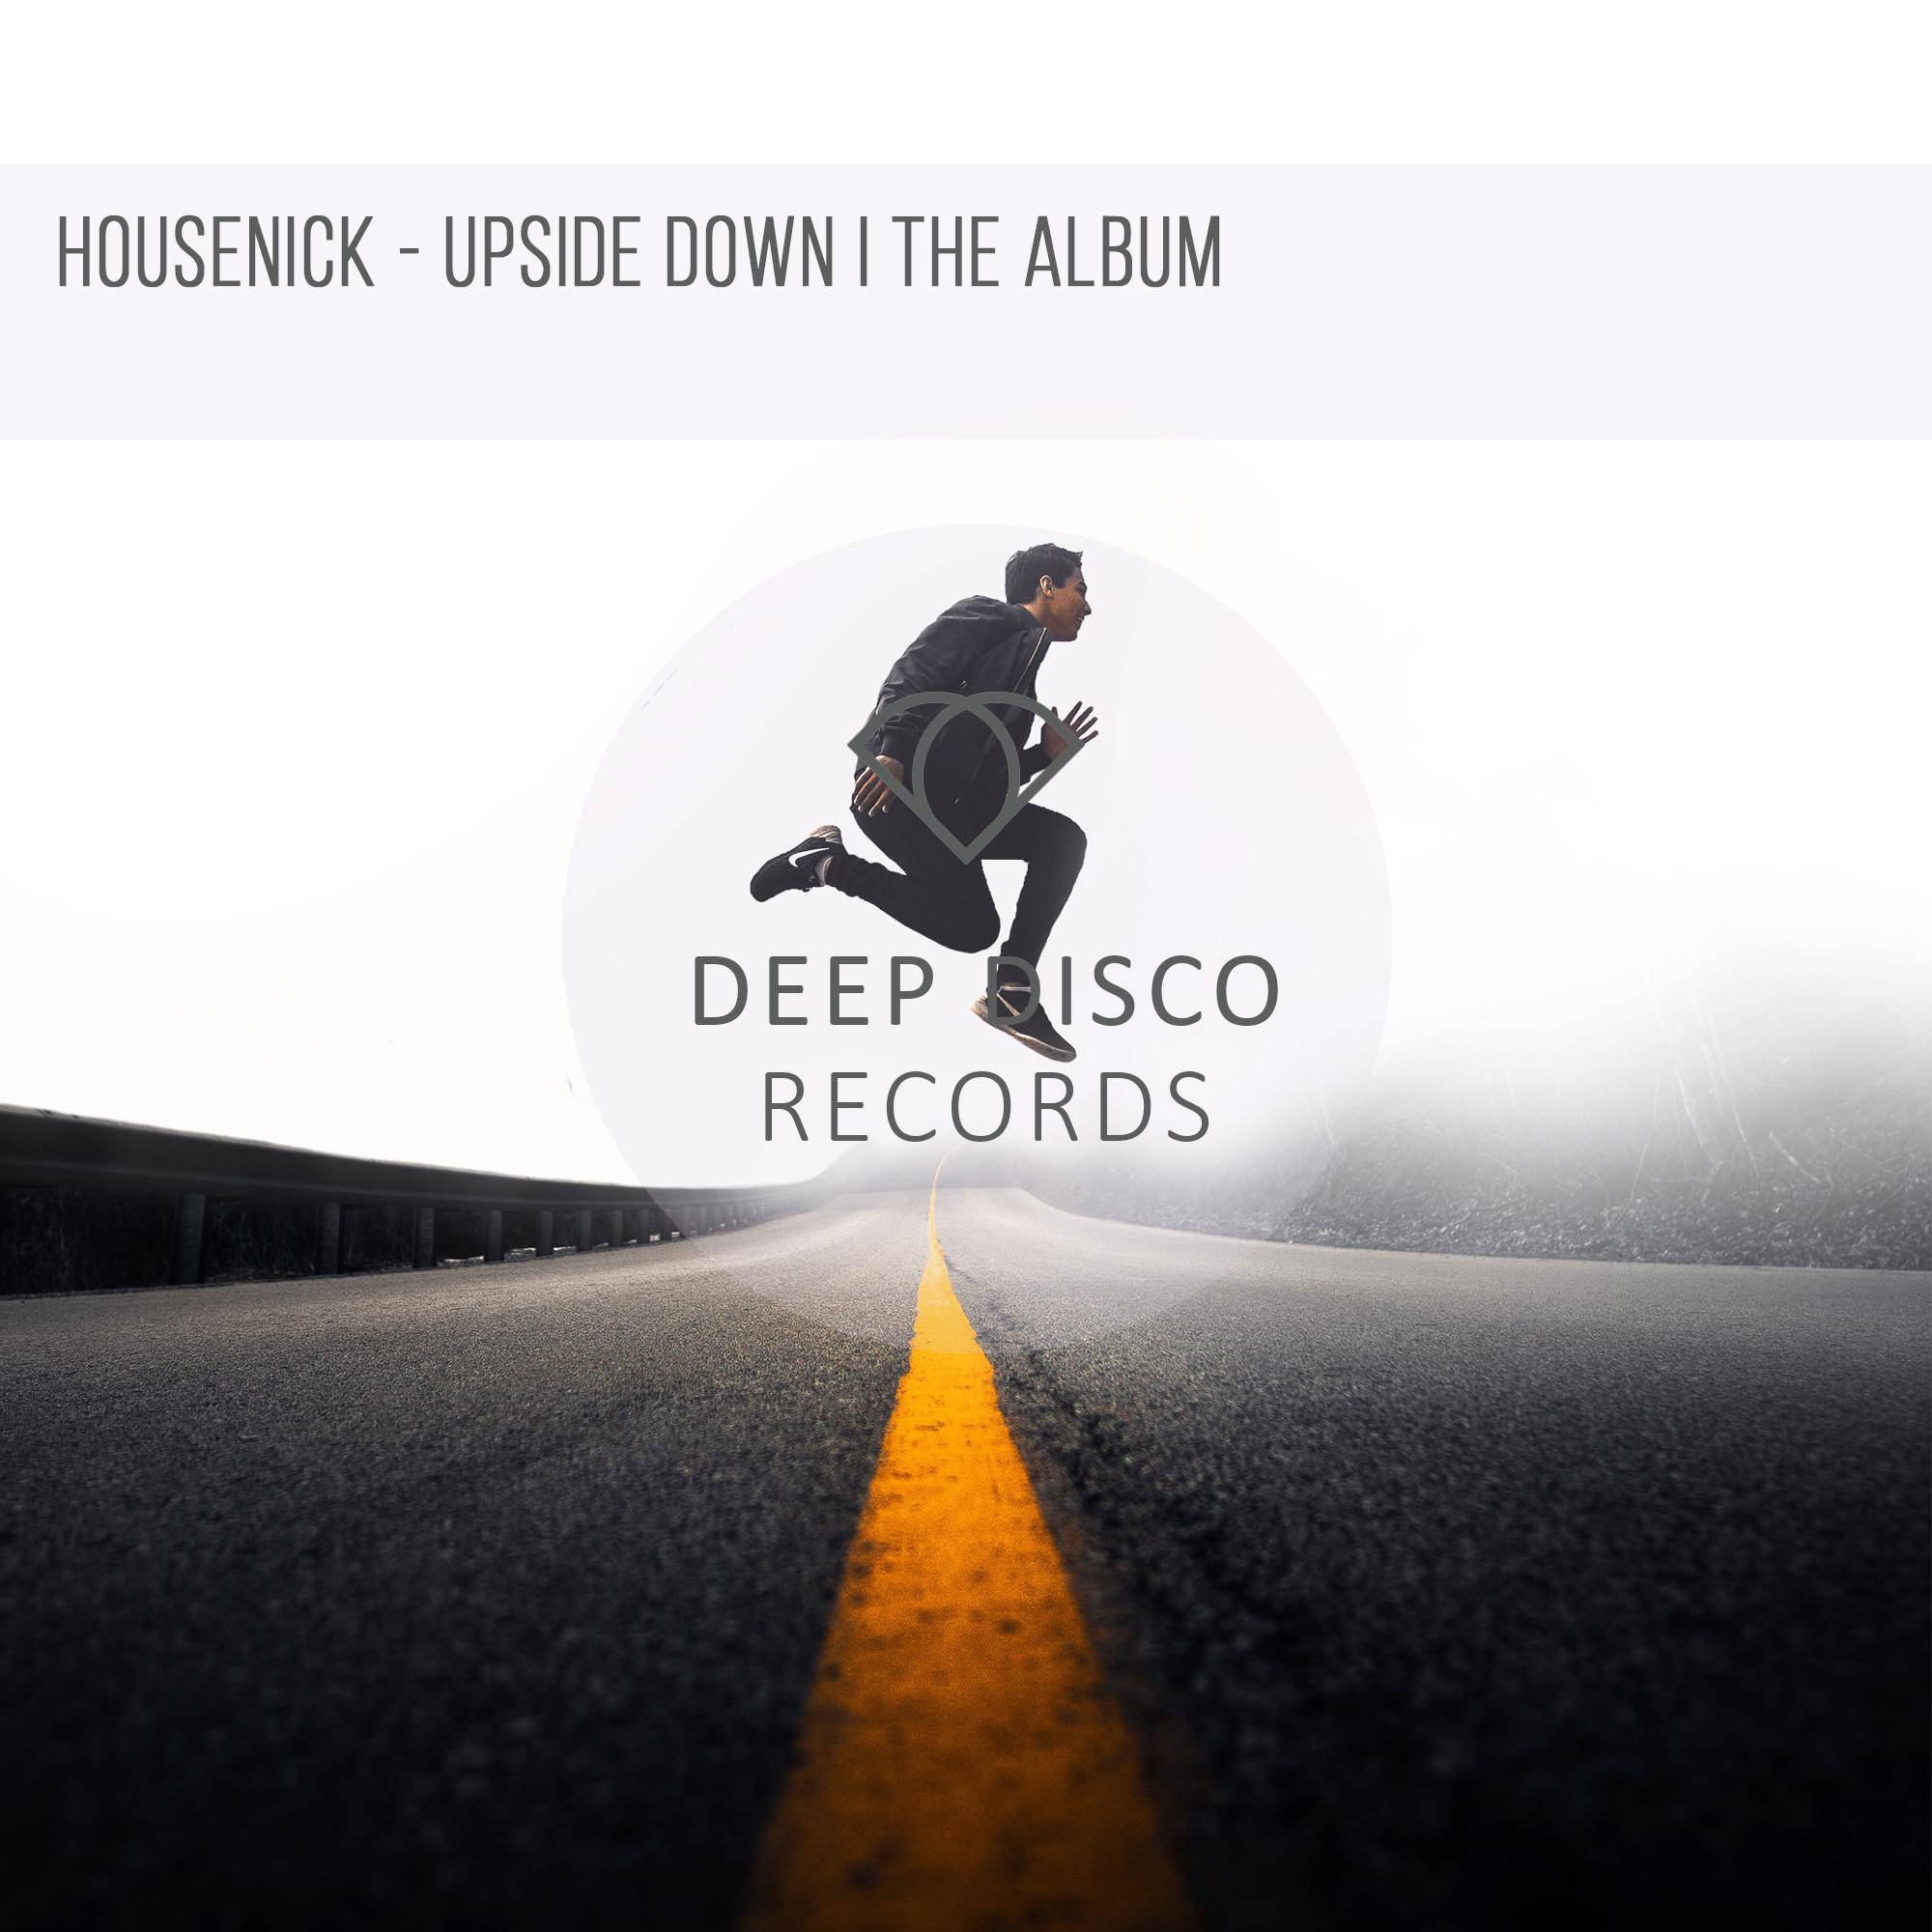 Housenick - Upside Down